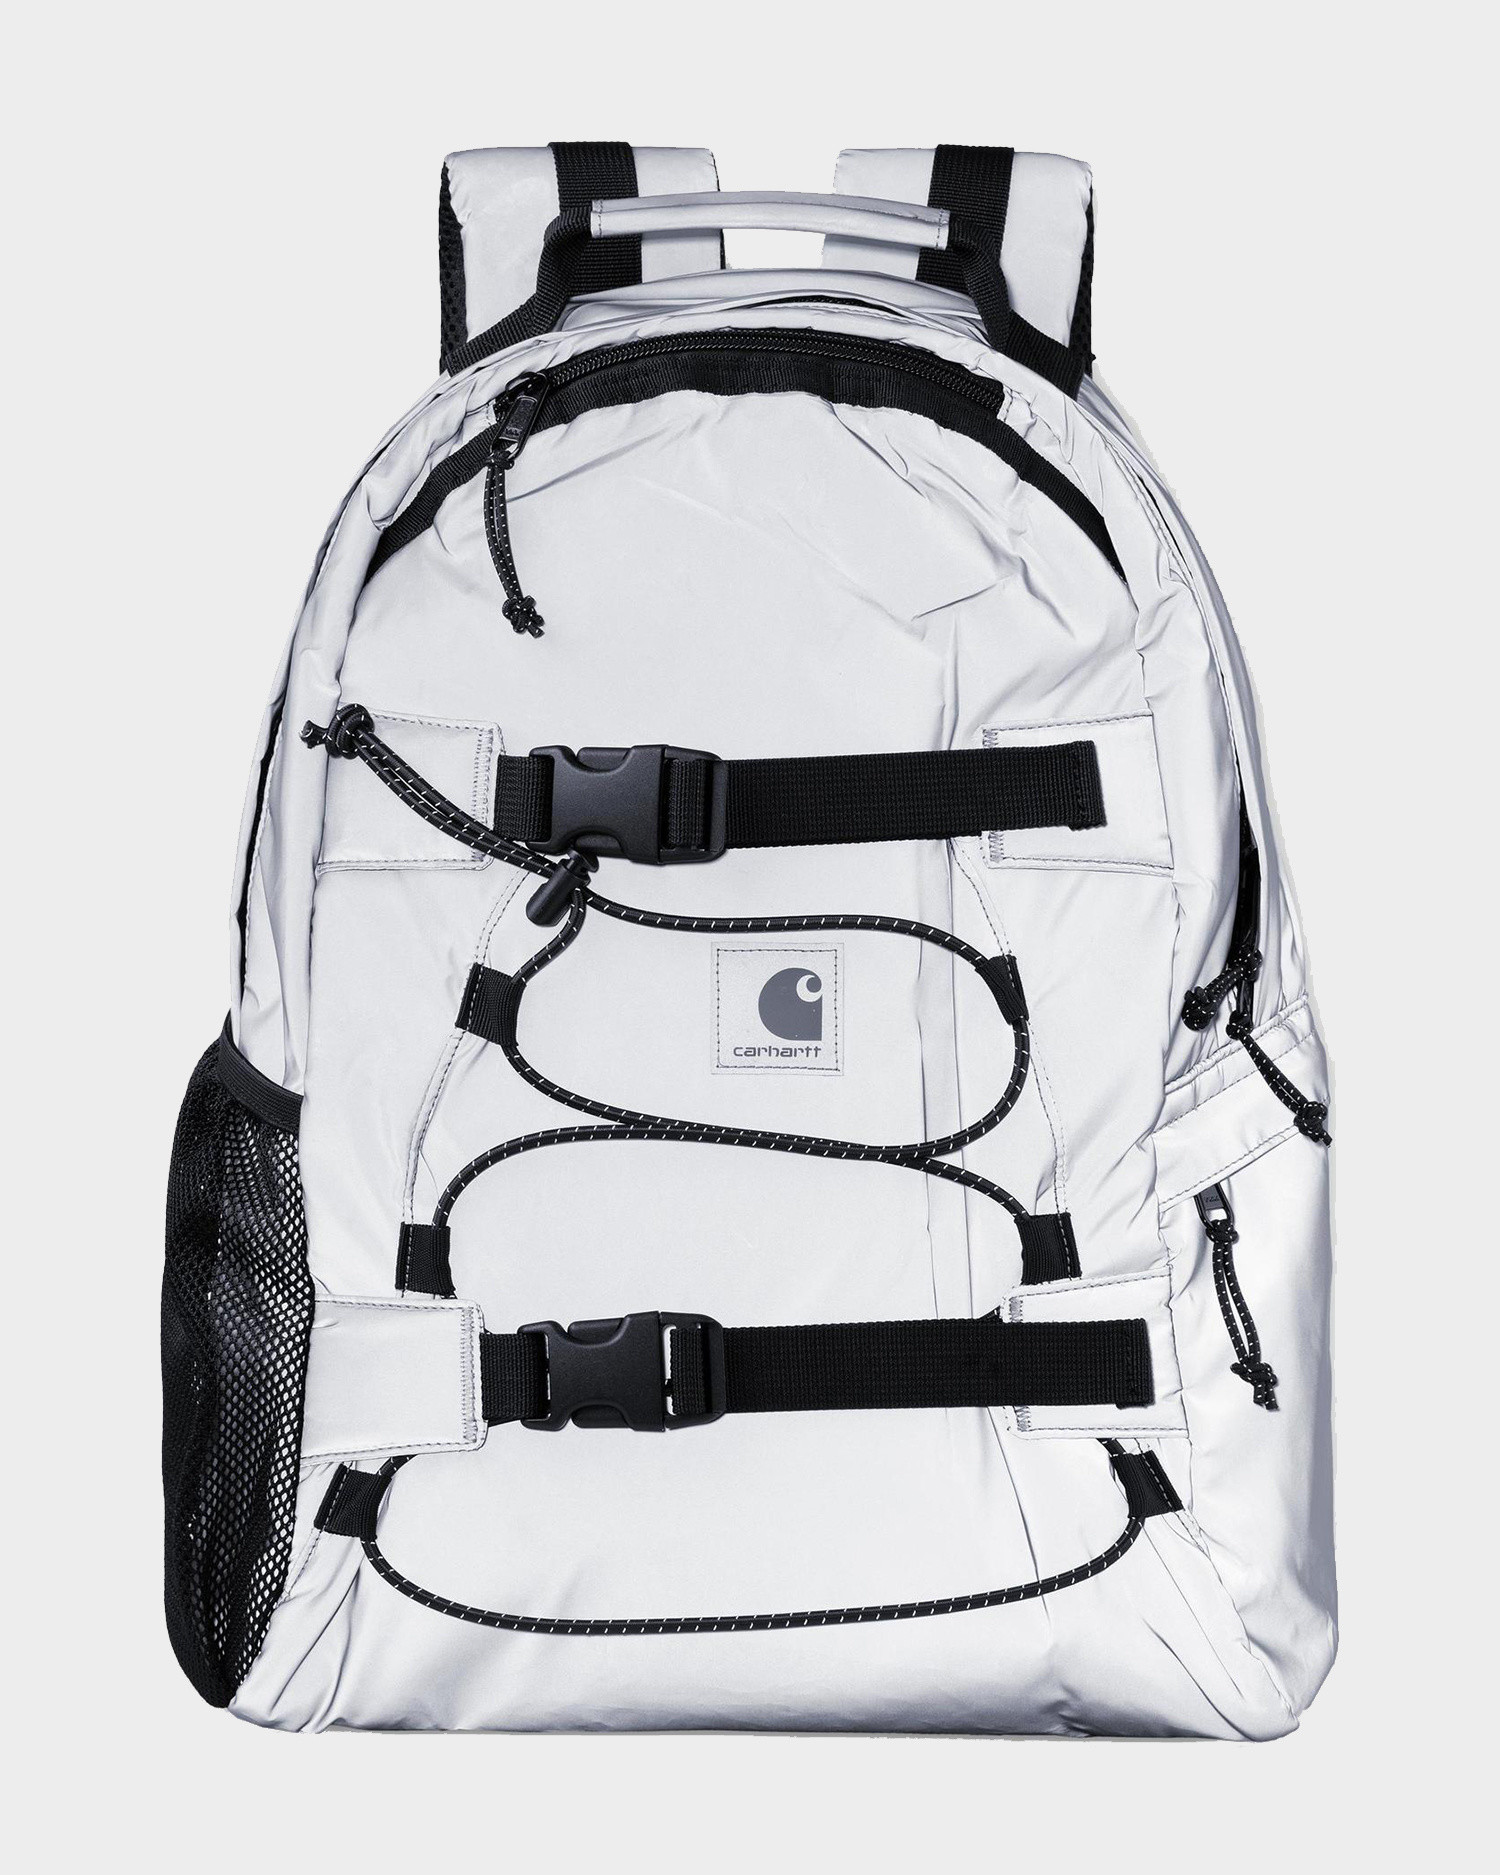 Carhartt Flect Kickflip Backpack Reflective